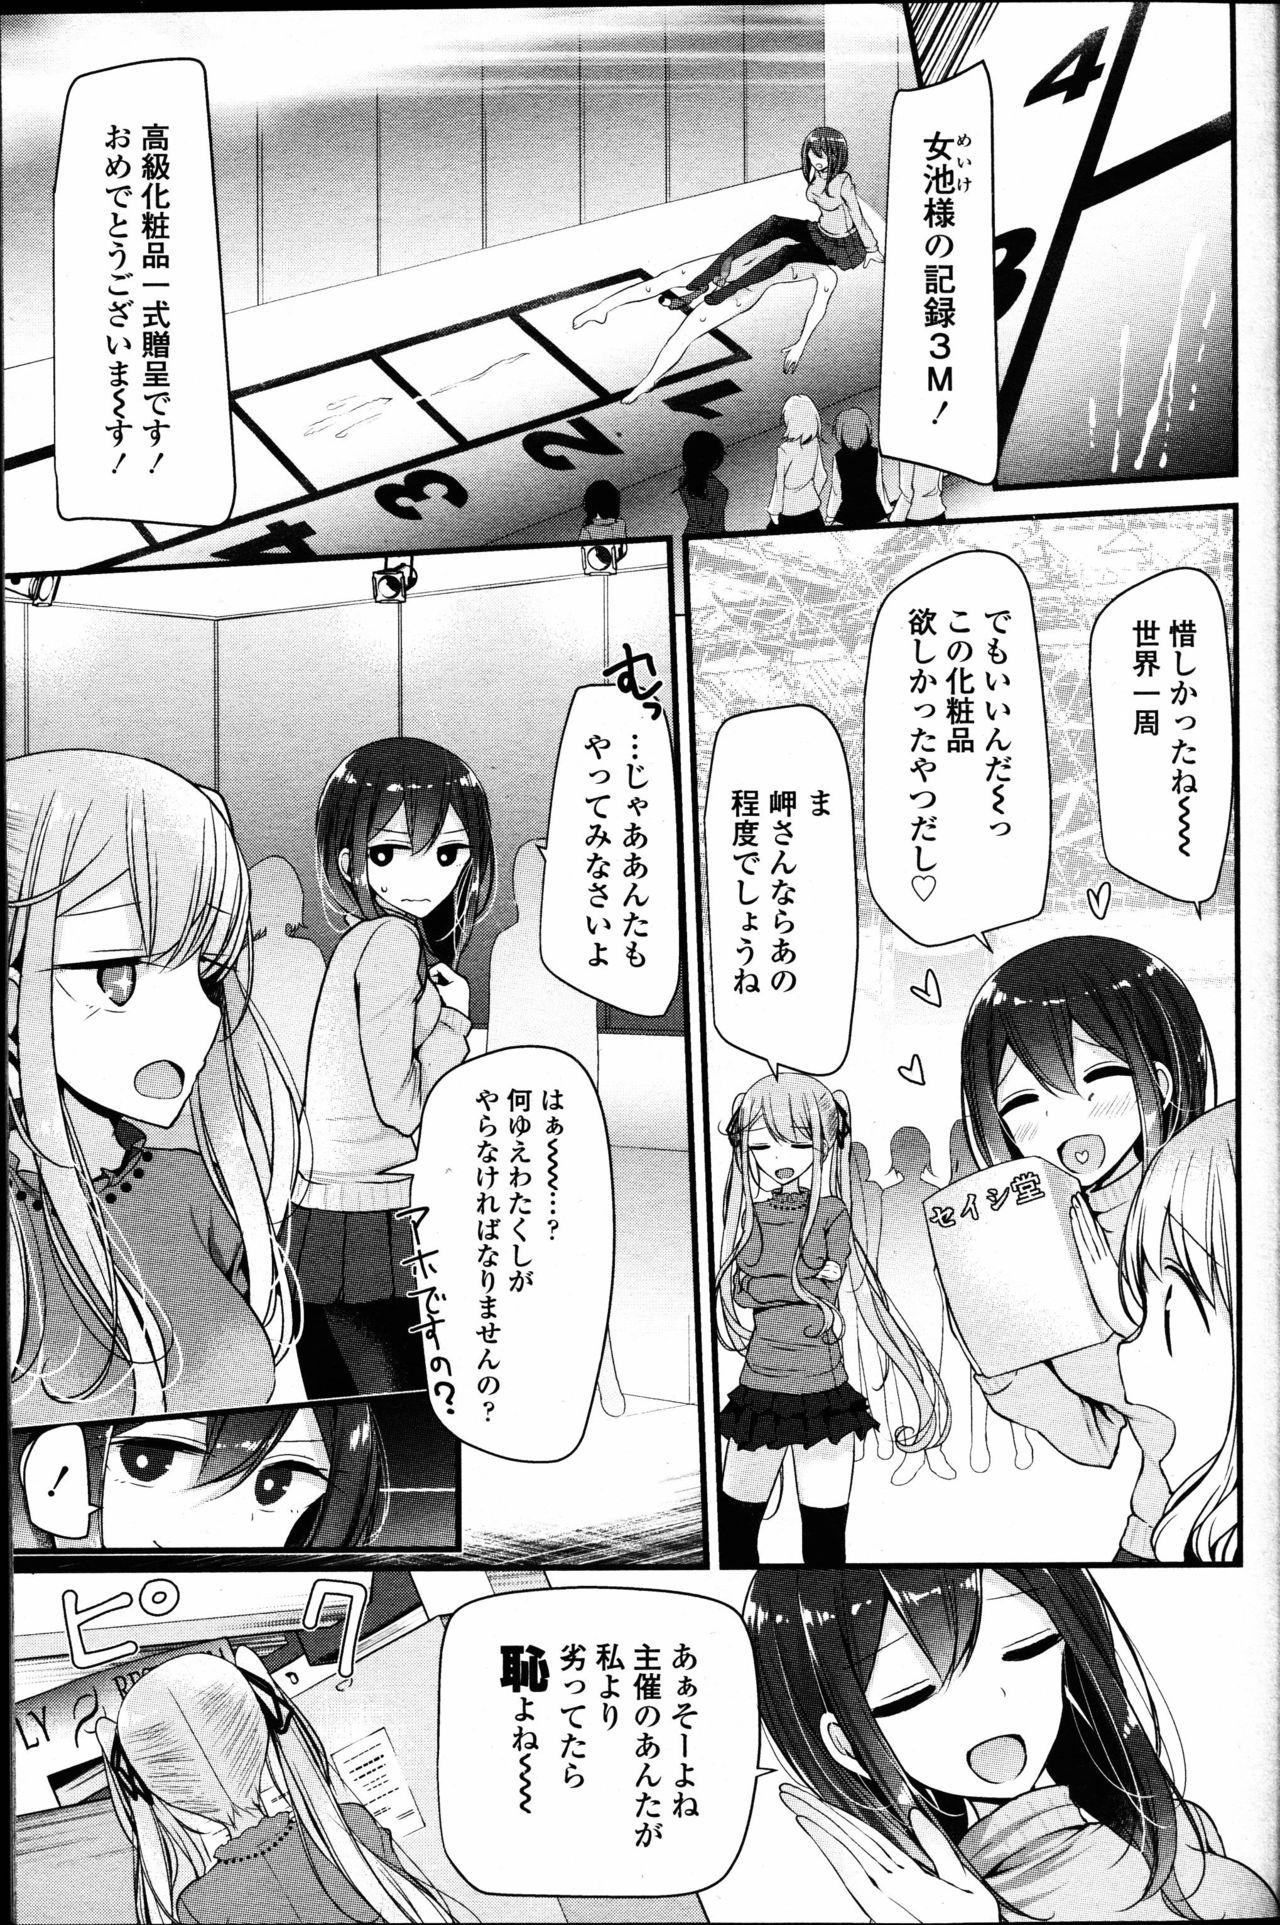 Girls forM Vol. 14 58